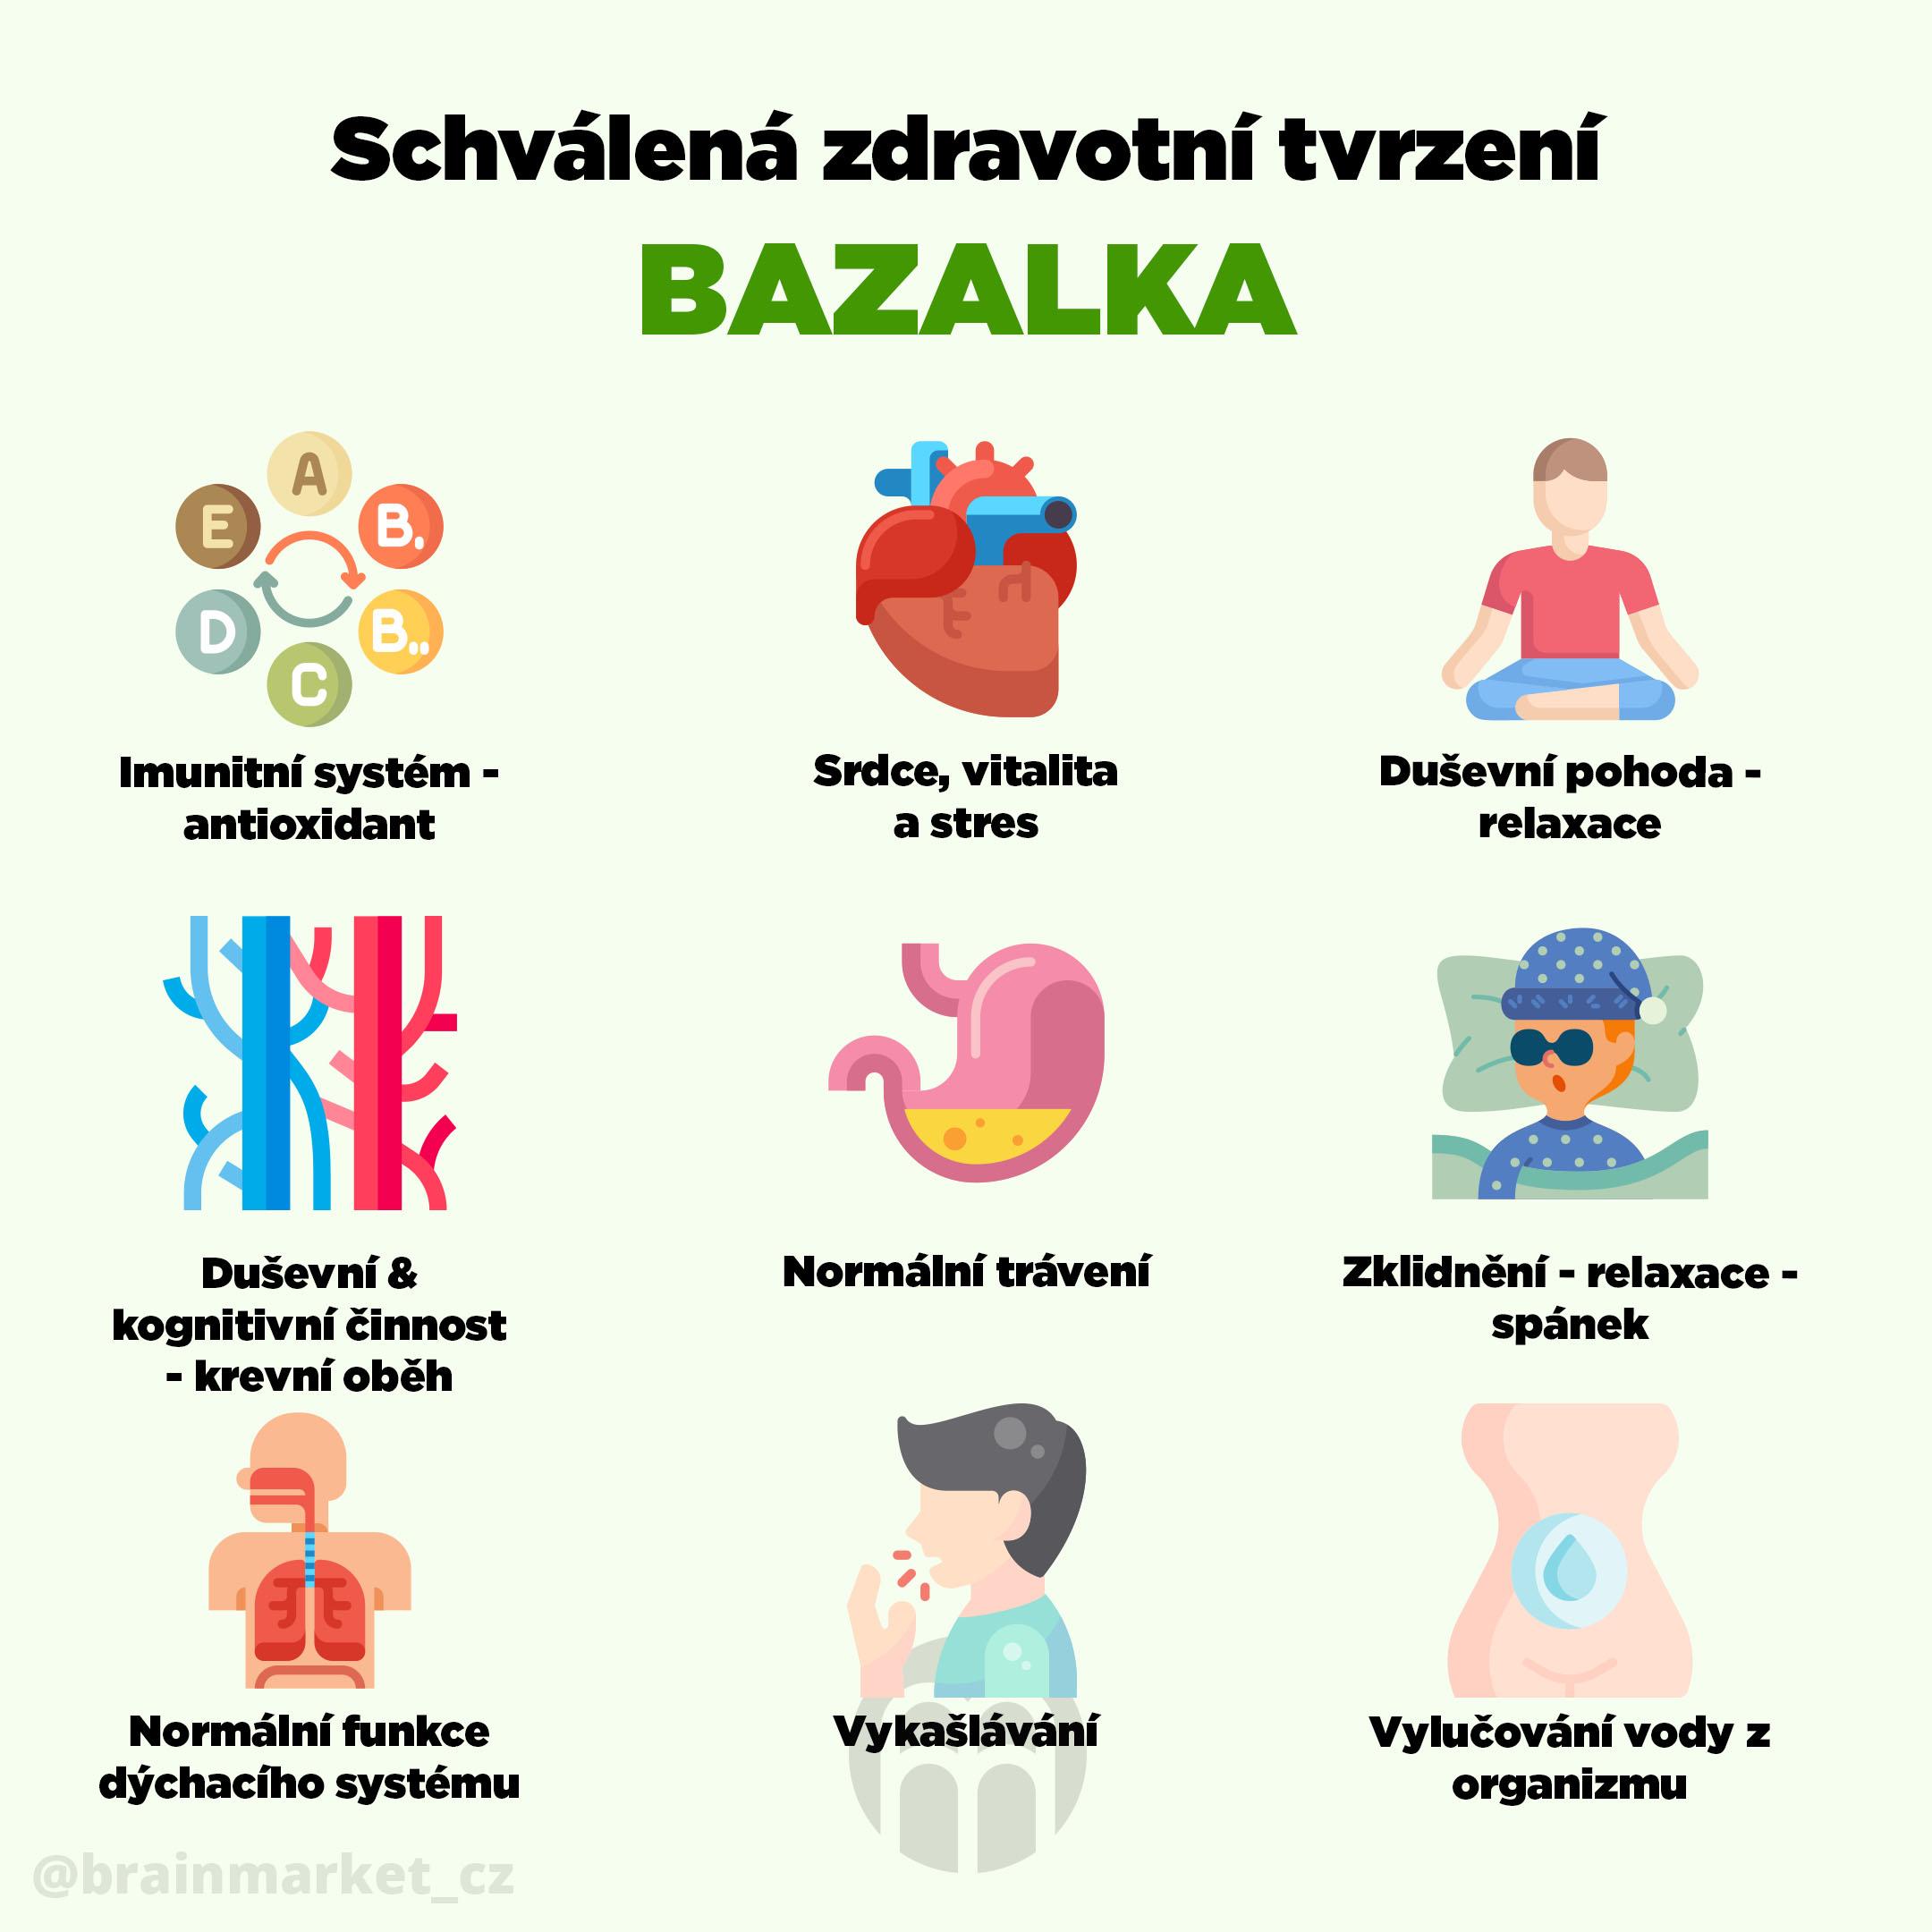 schvalena_zdrav_bazalka_infografika_brainmarket_cz